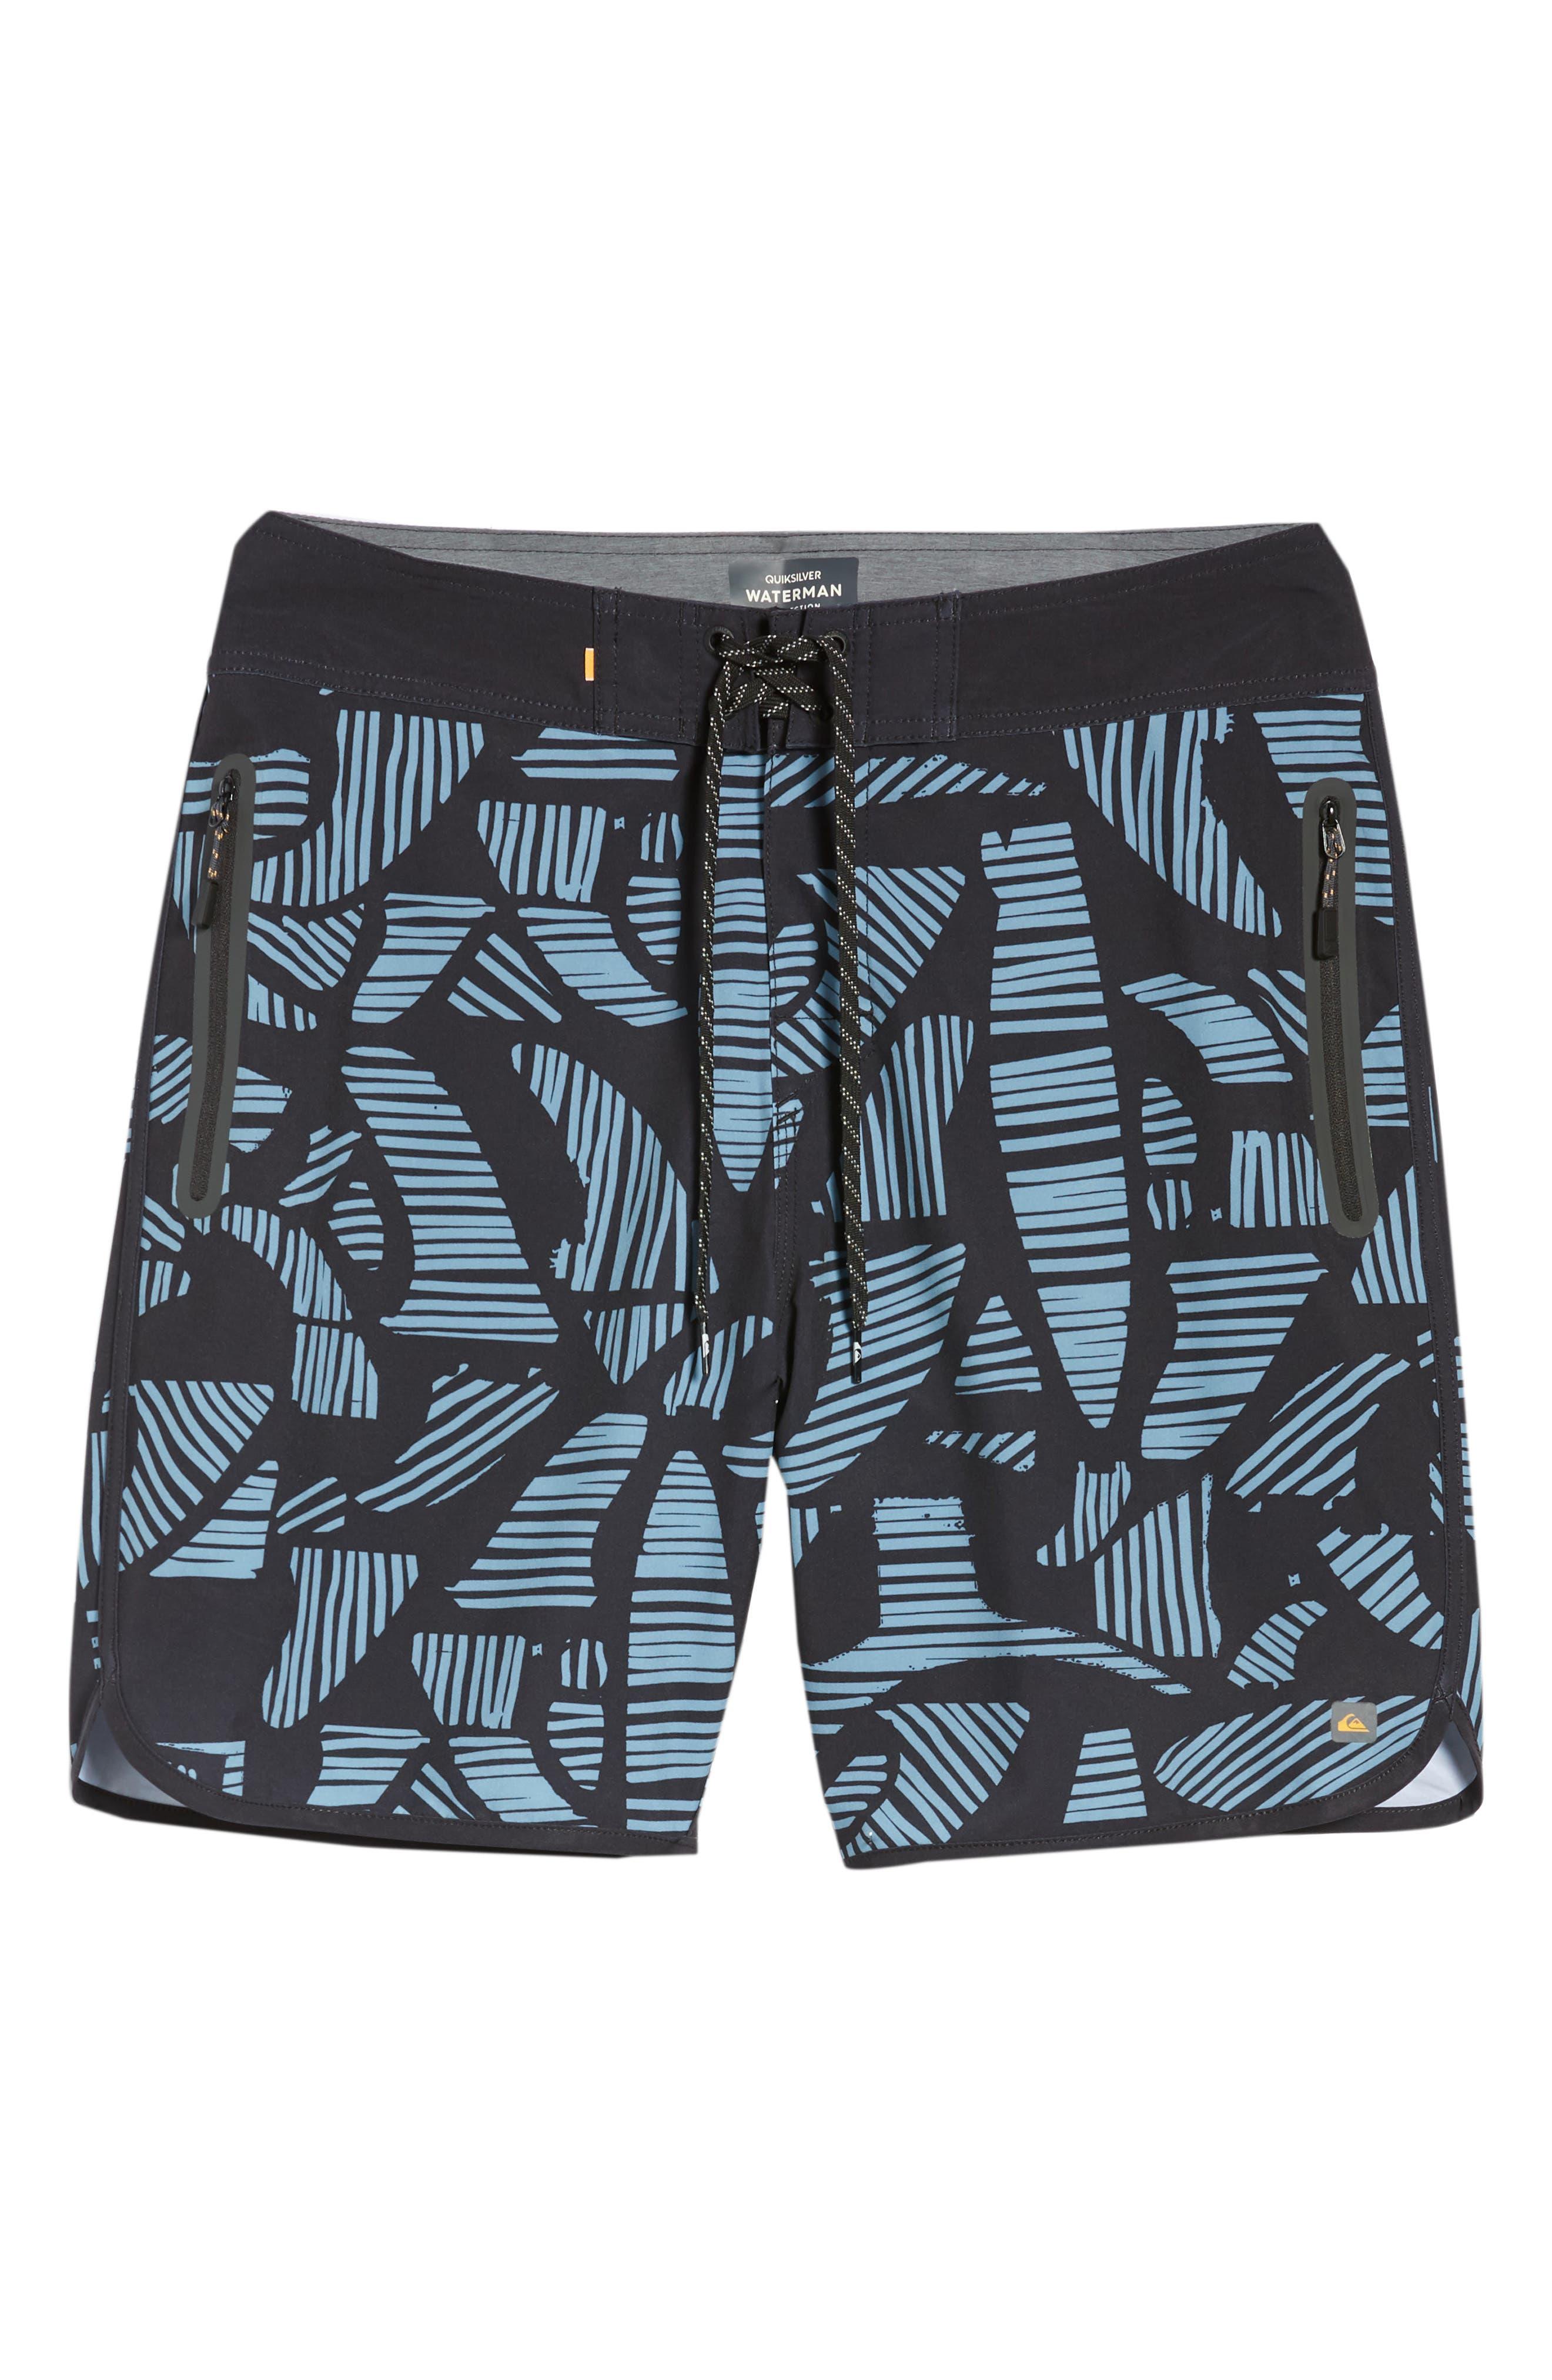 Odysea Board Shorts,                             Alternate thumbnail 6, color,                             Black